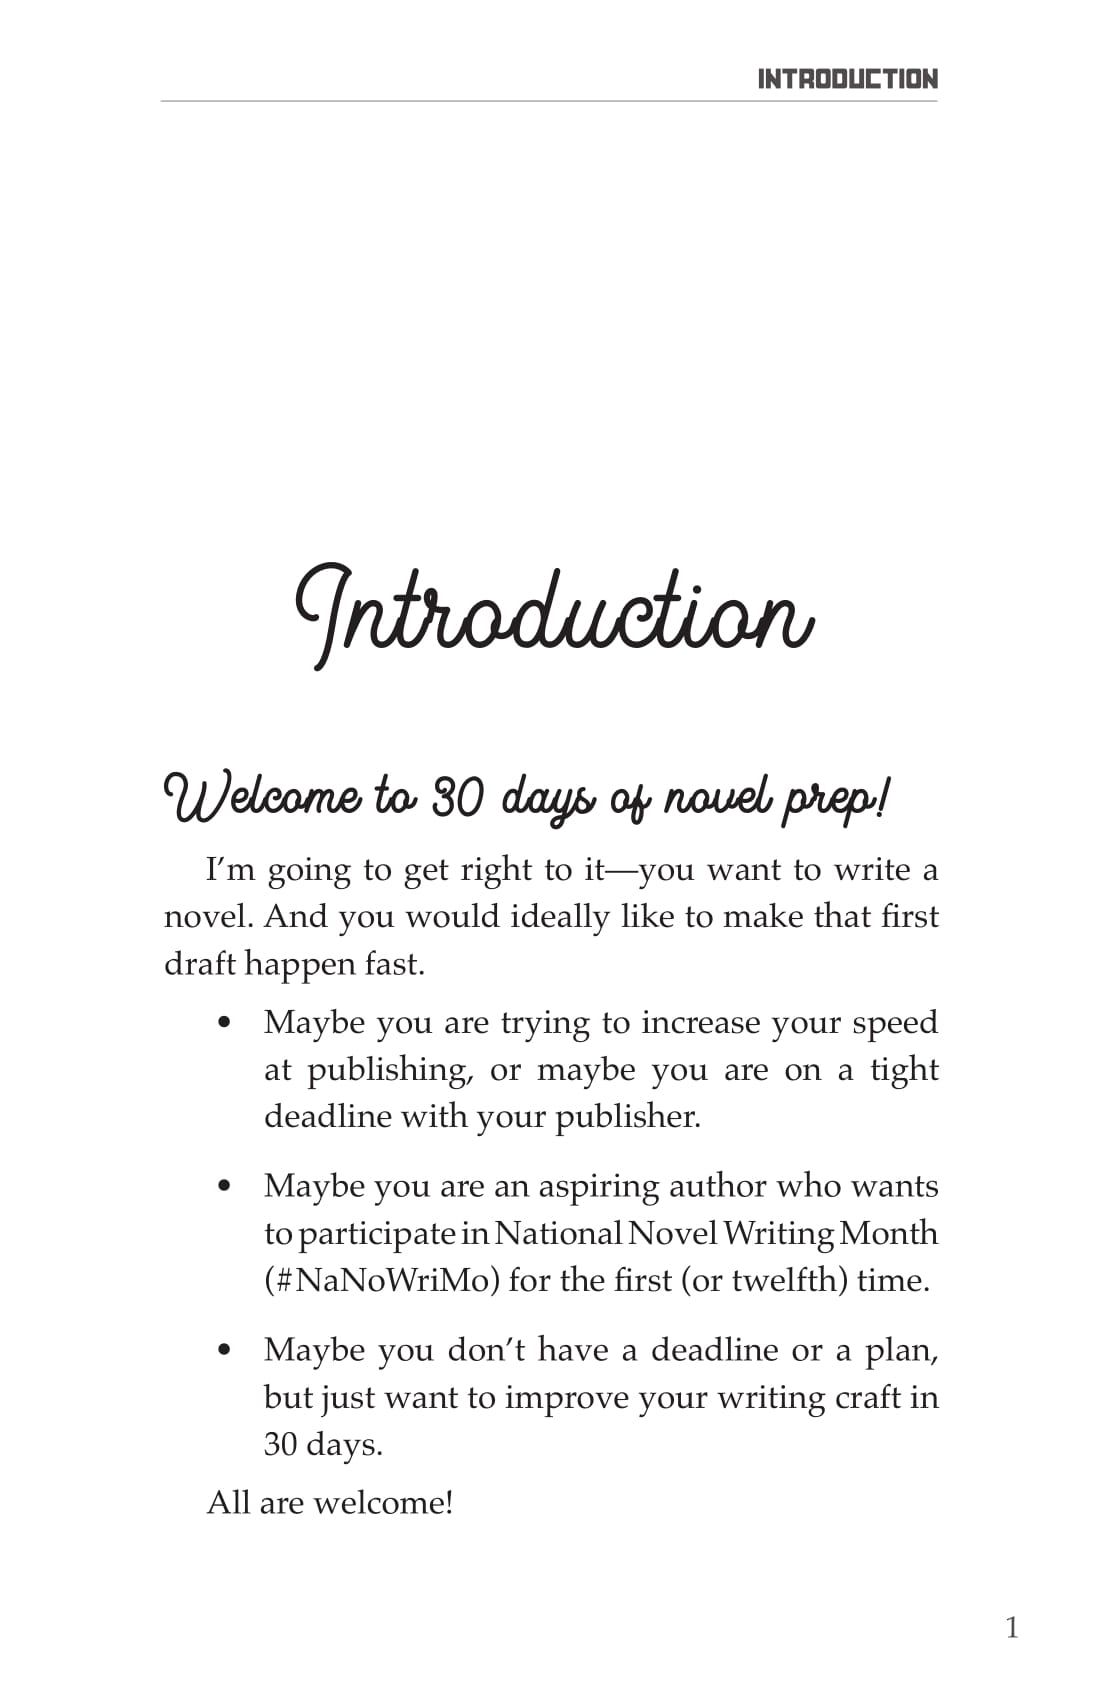 Novel Writing Prep Introduction-1